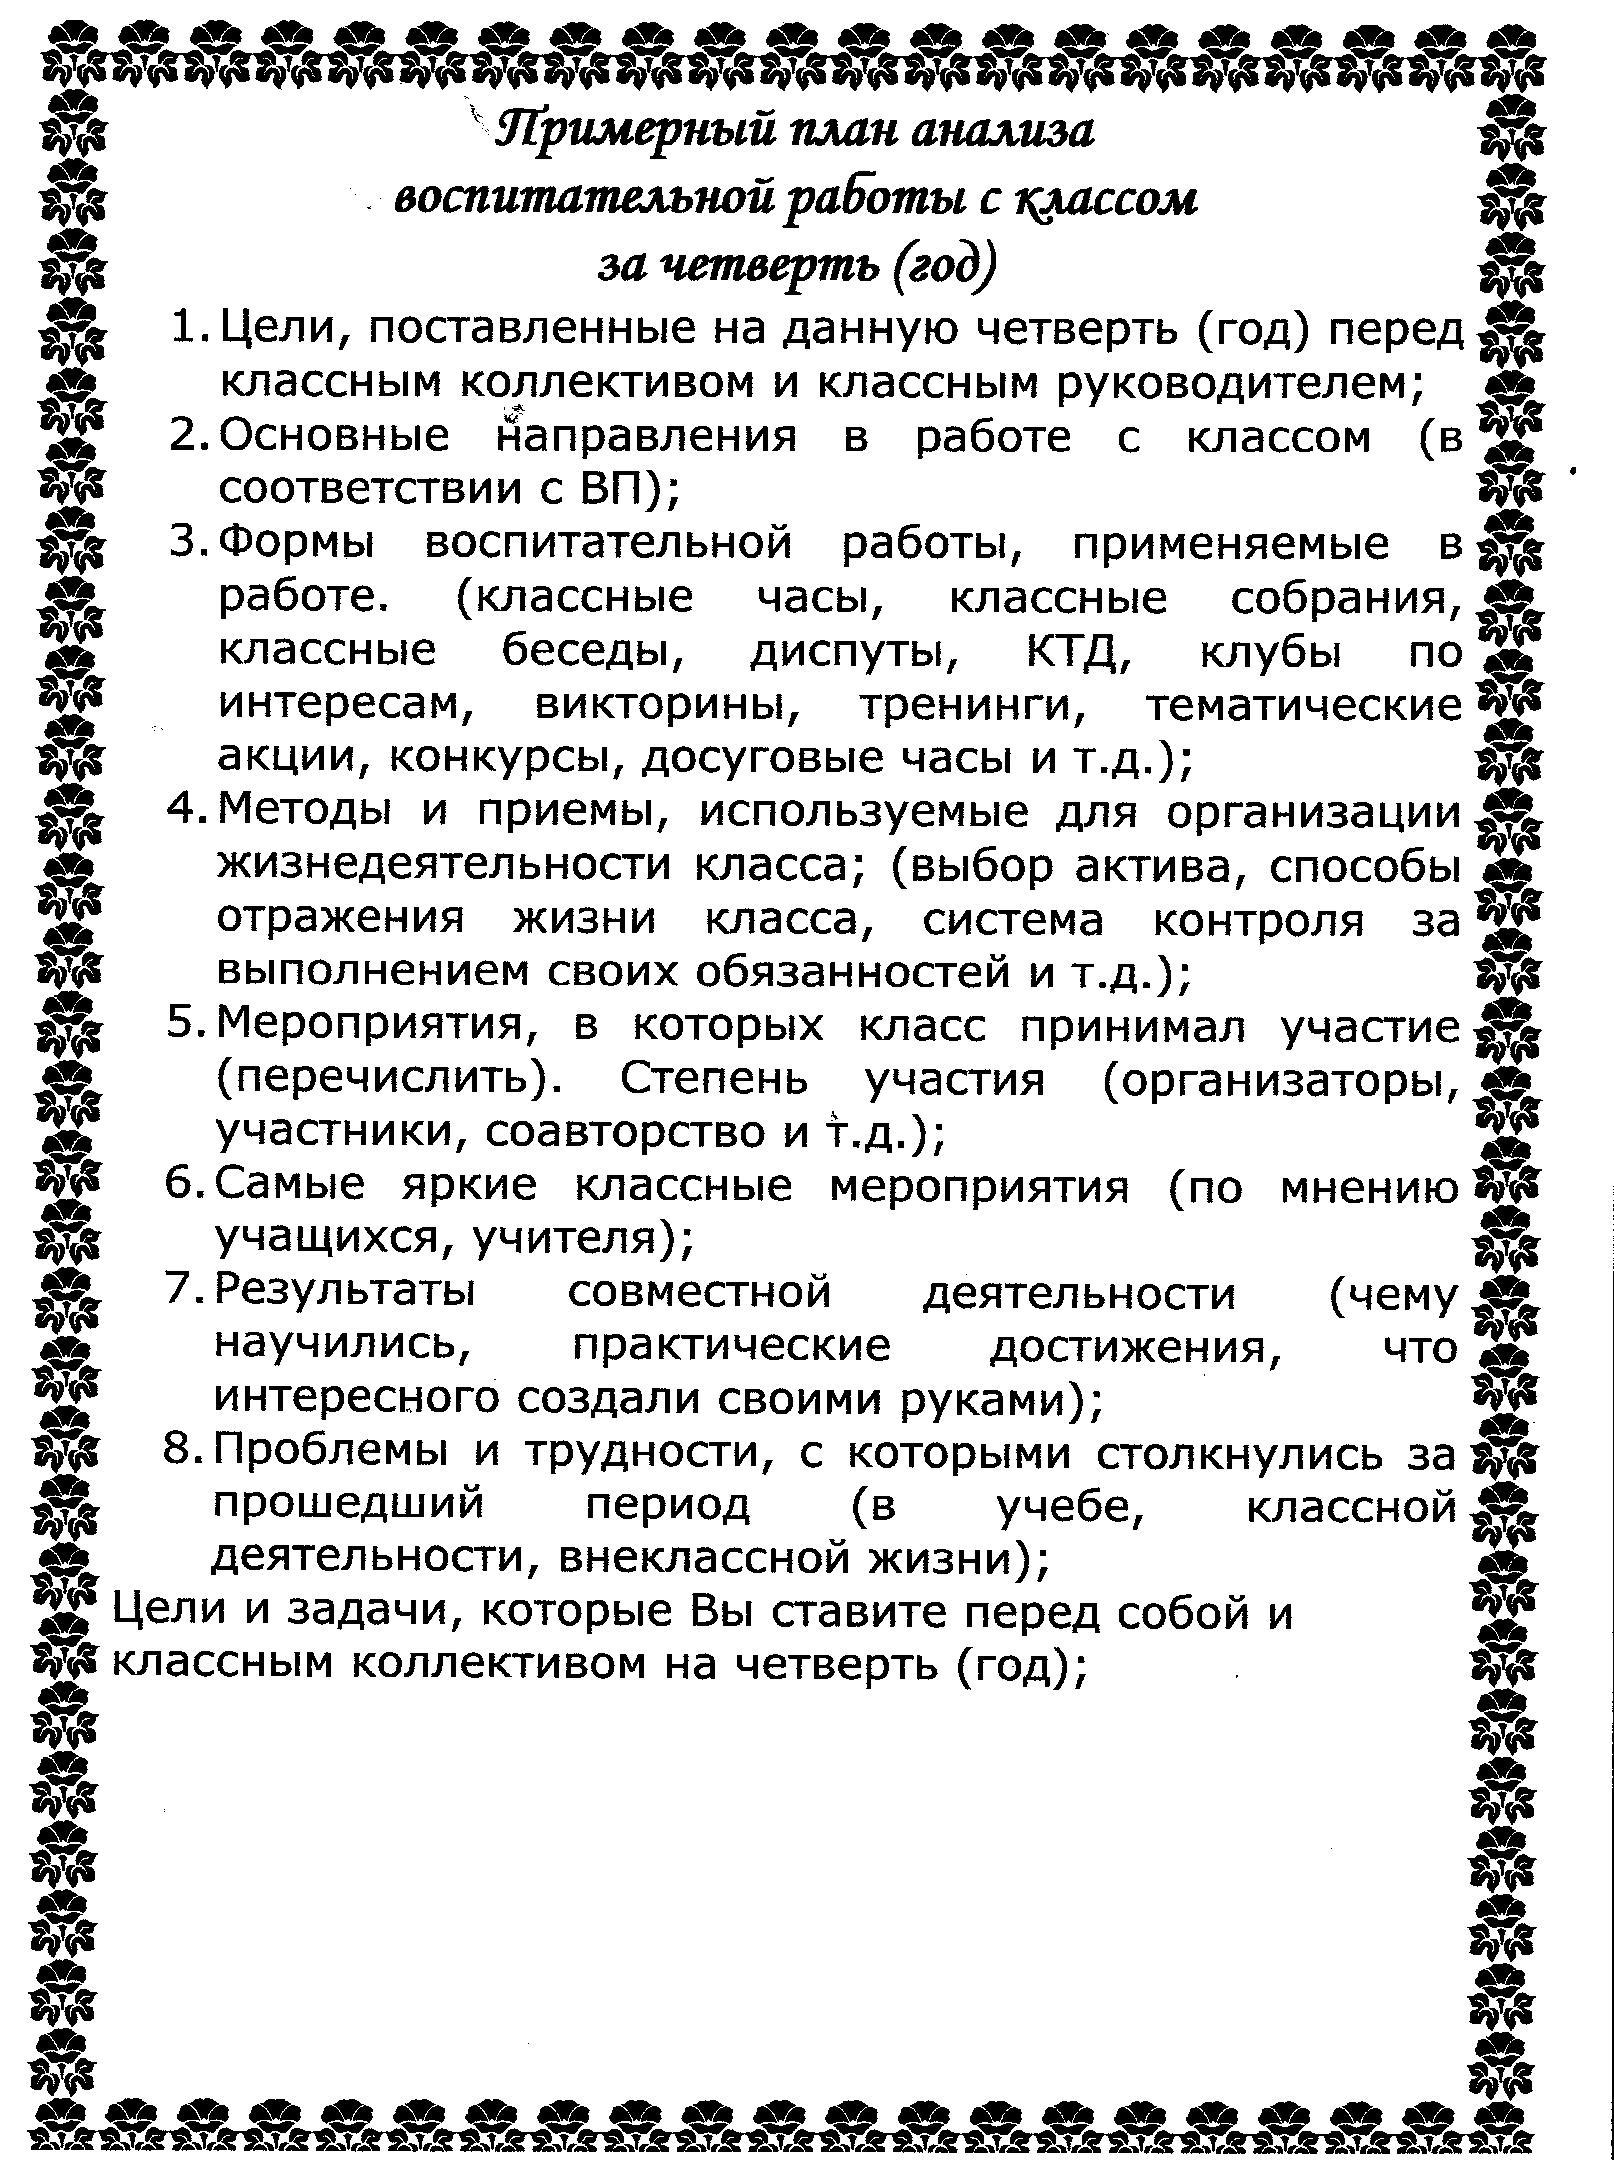 C:\Documents and Settings\Admin\Рабочий стол\Изображение5641631321 004.jpg